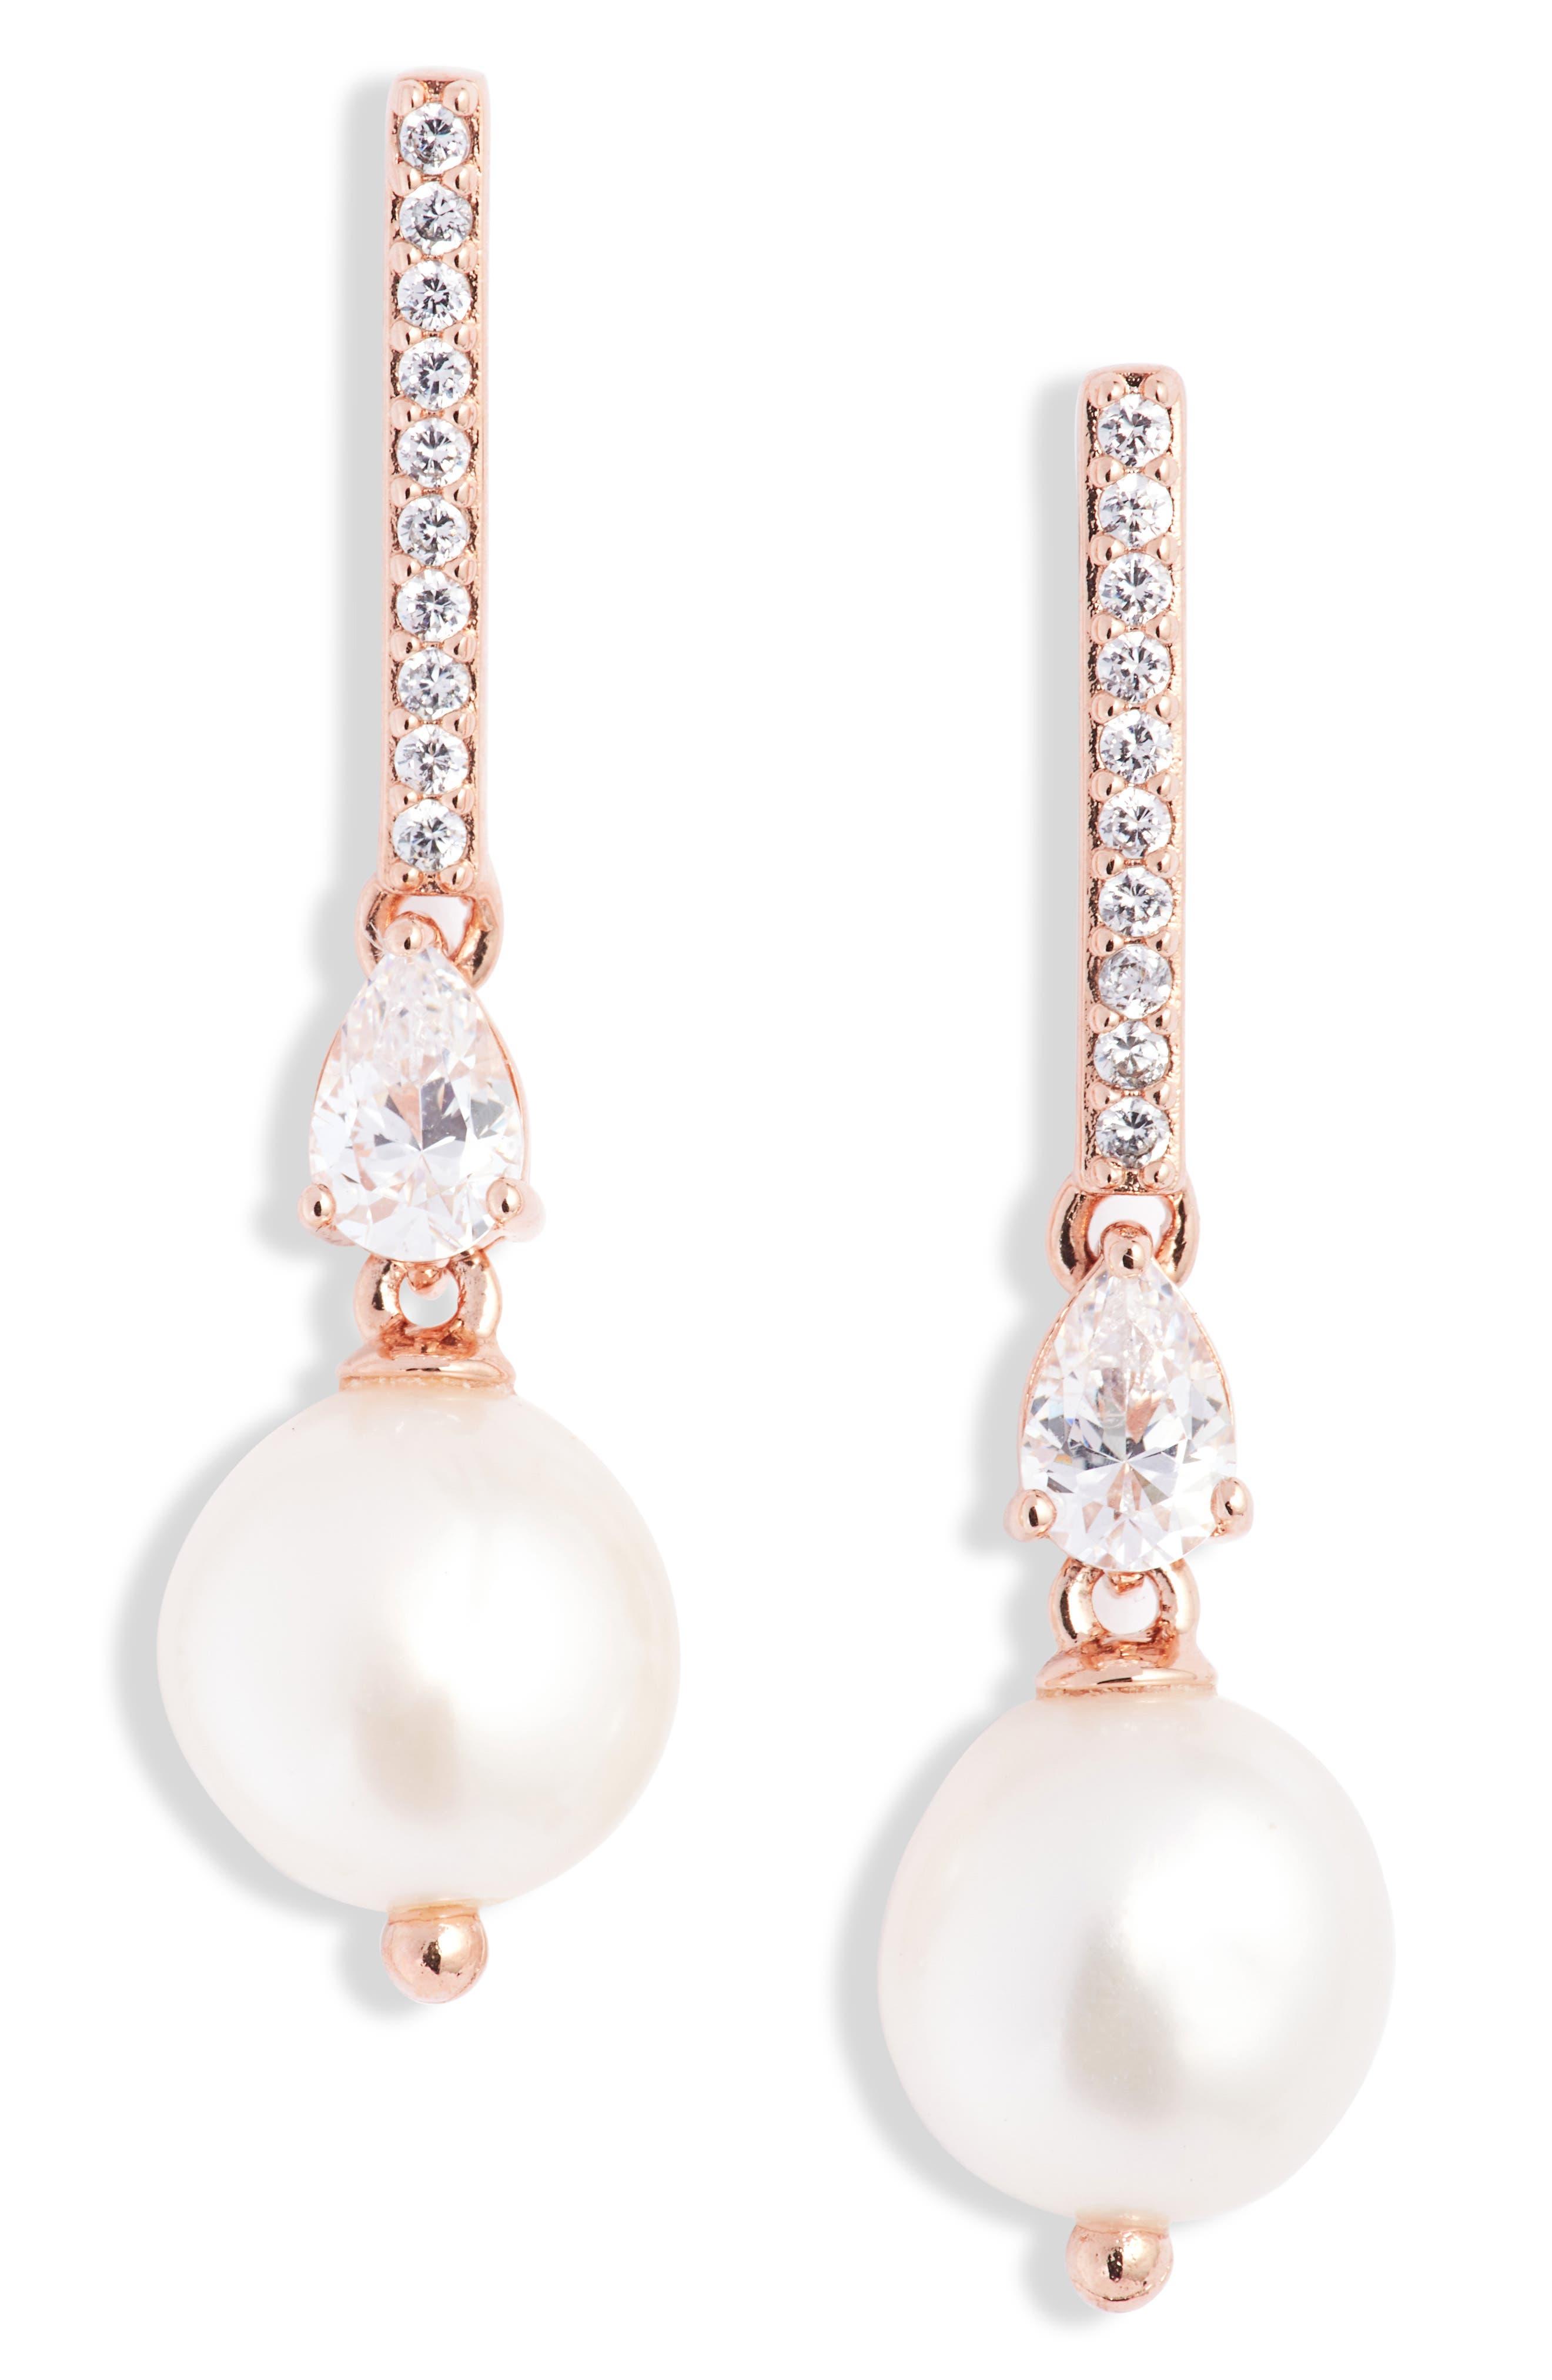 Mother of pear earrings BOSS LADY Large Pearl cluster earrings